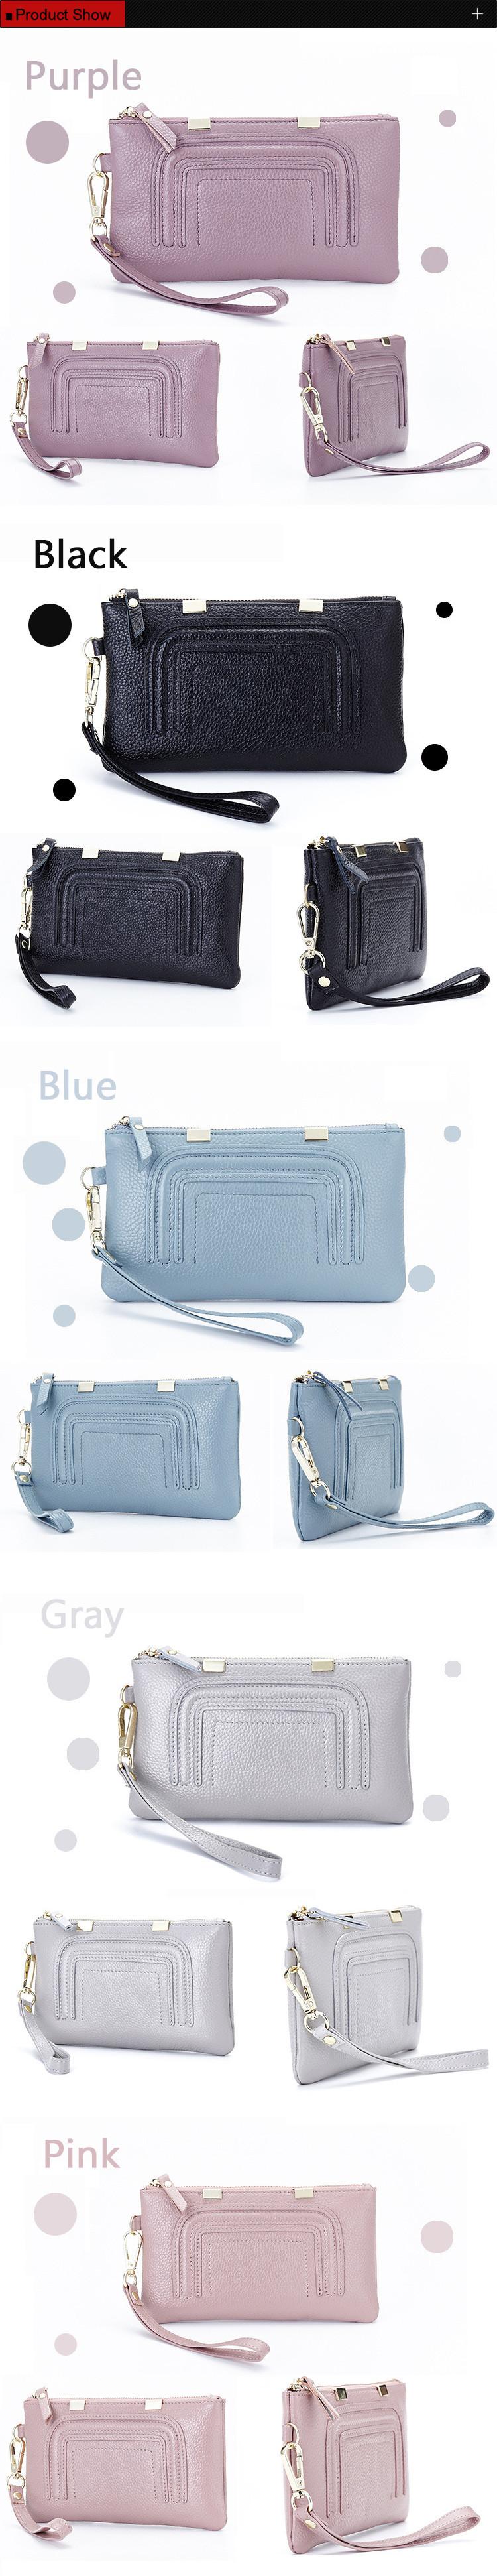 woman-handbag2